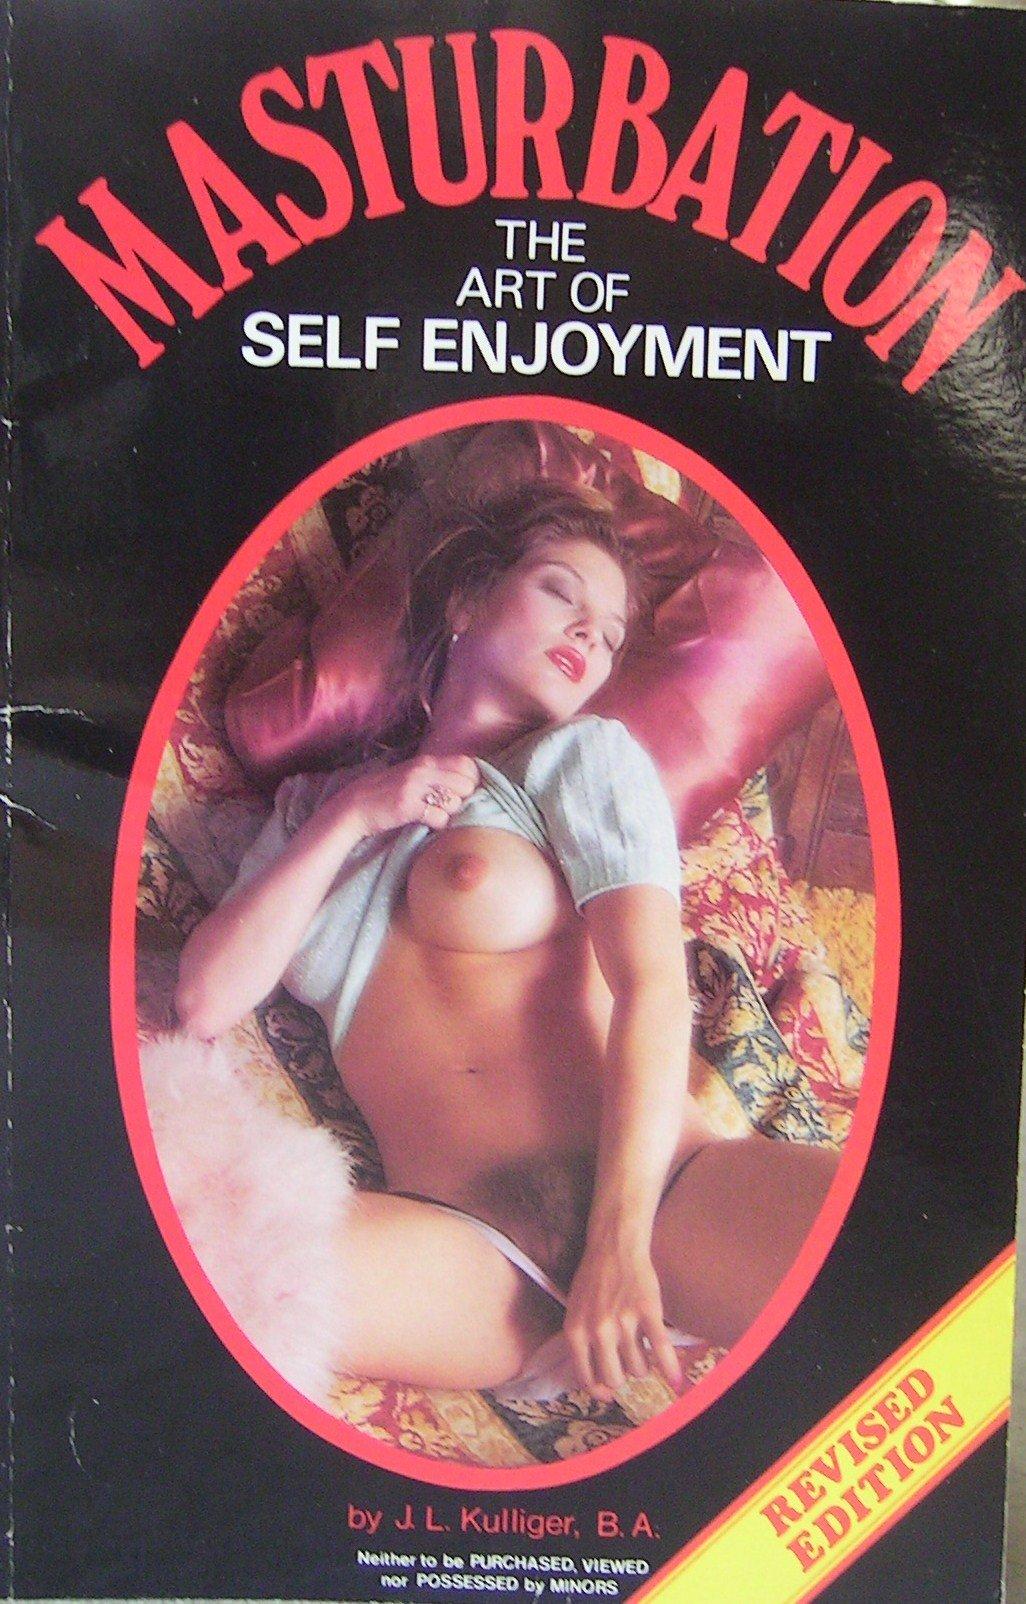 enjoyment-of-masturbation-chassis